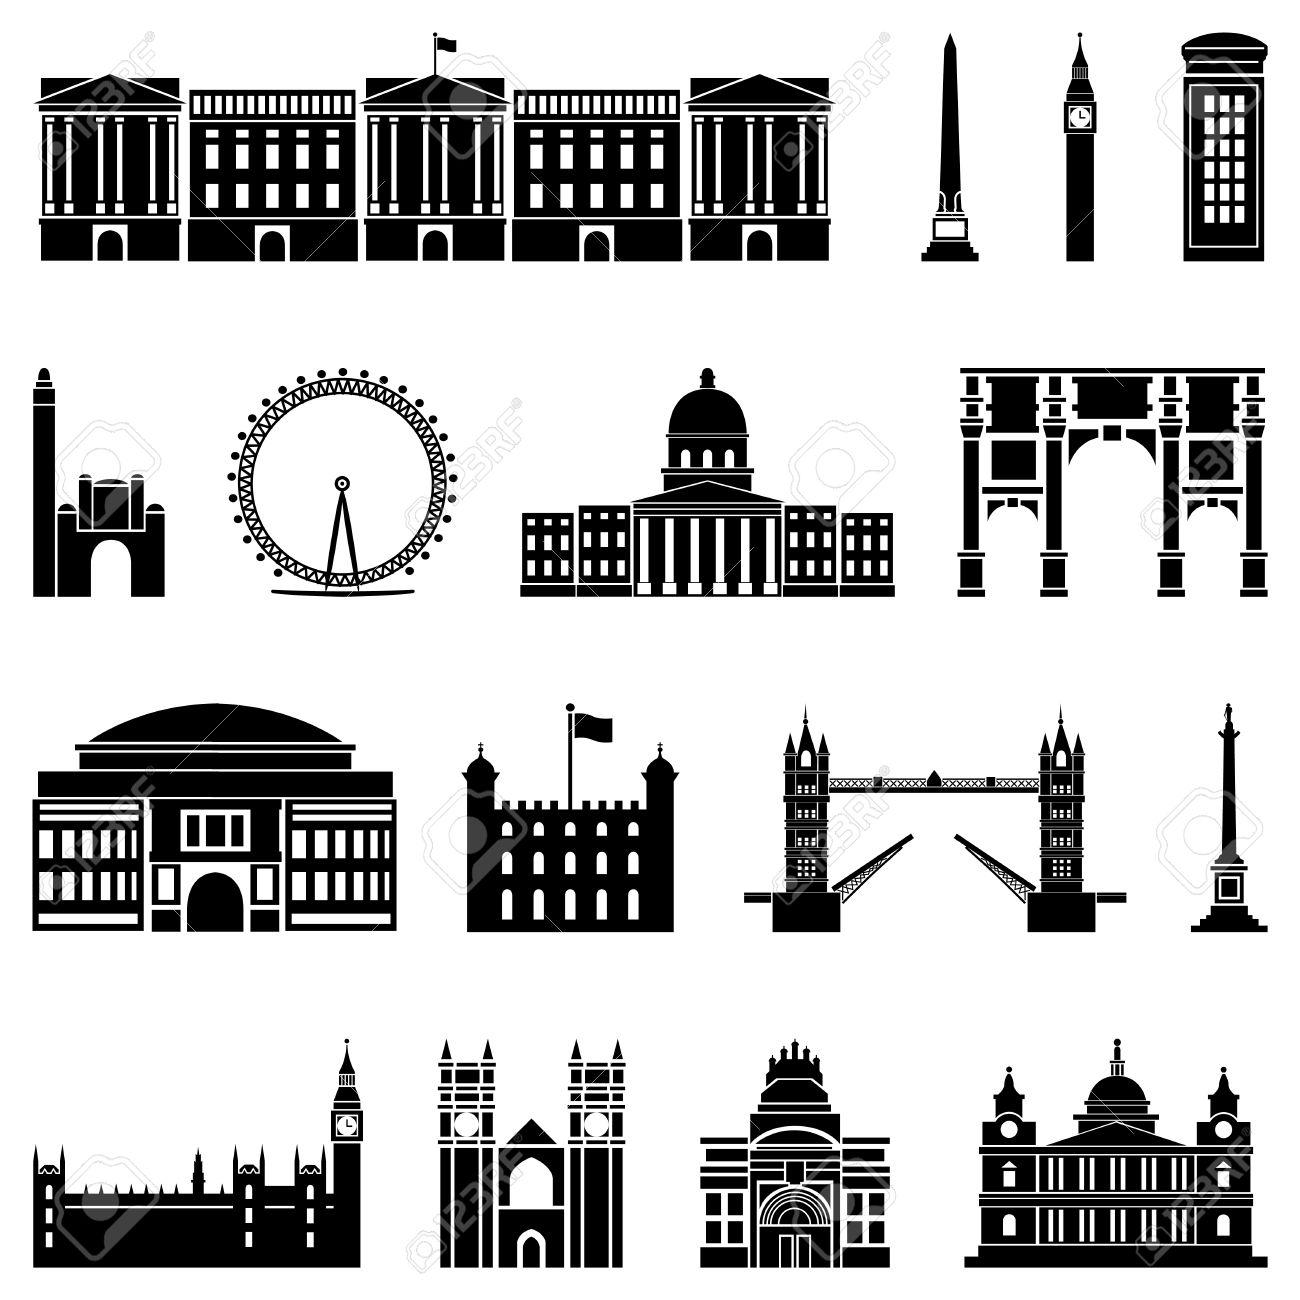 London Landmarks Silhouette.